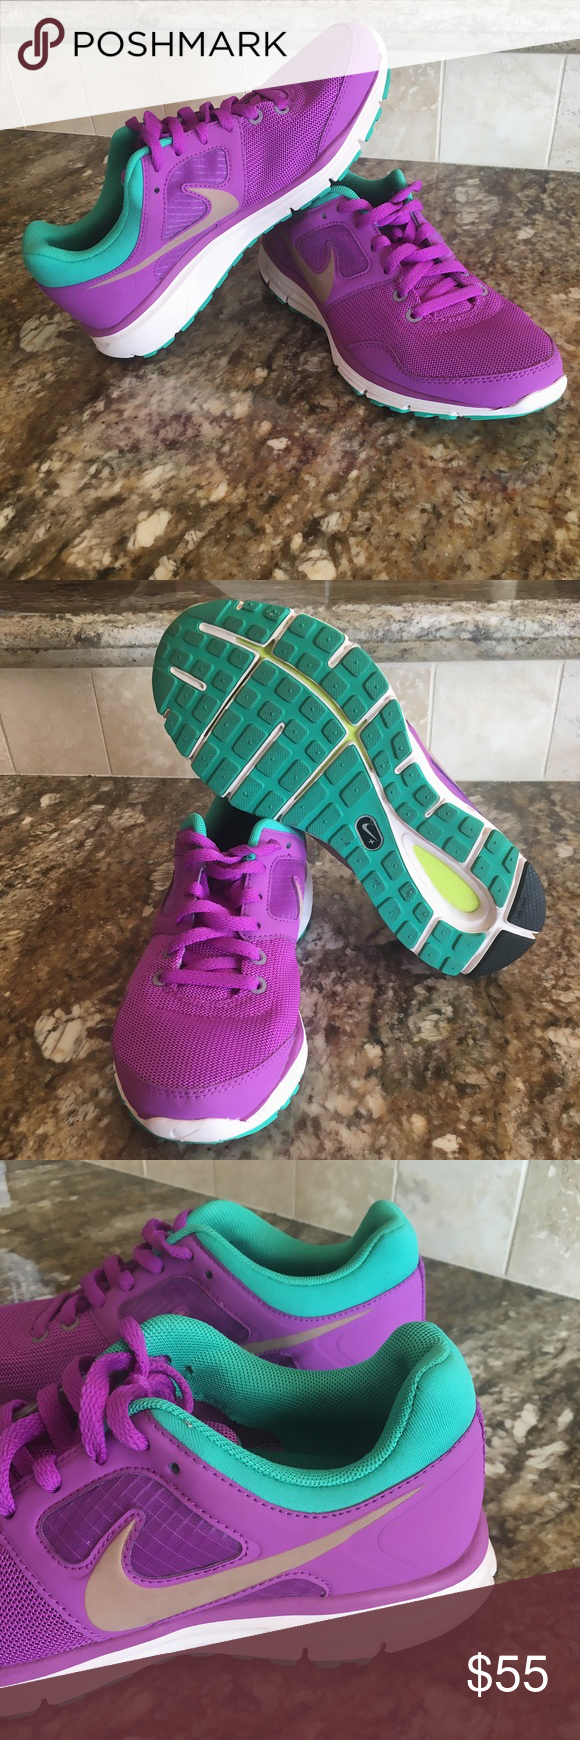 49c9e0ec887f Women s Nike LunarFly 4 Laser Purple   Metallic Red Brnz Like new without  box Nike Shoes Sneakers